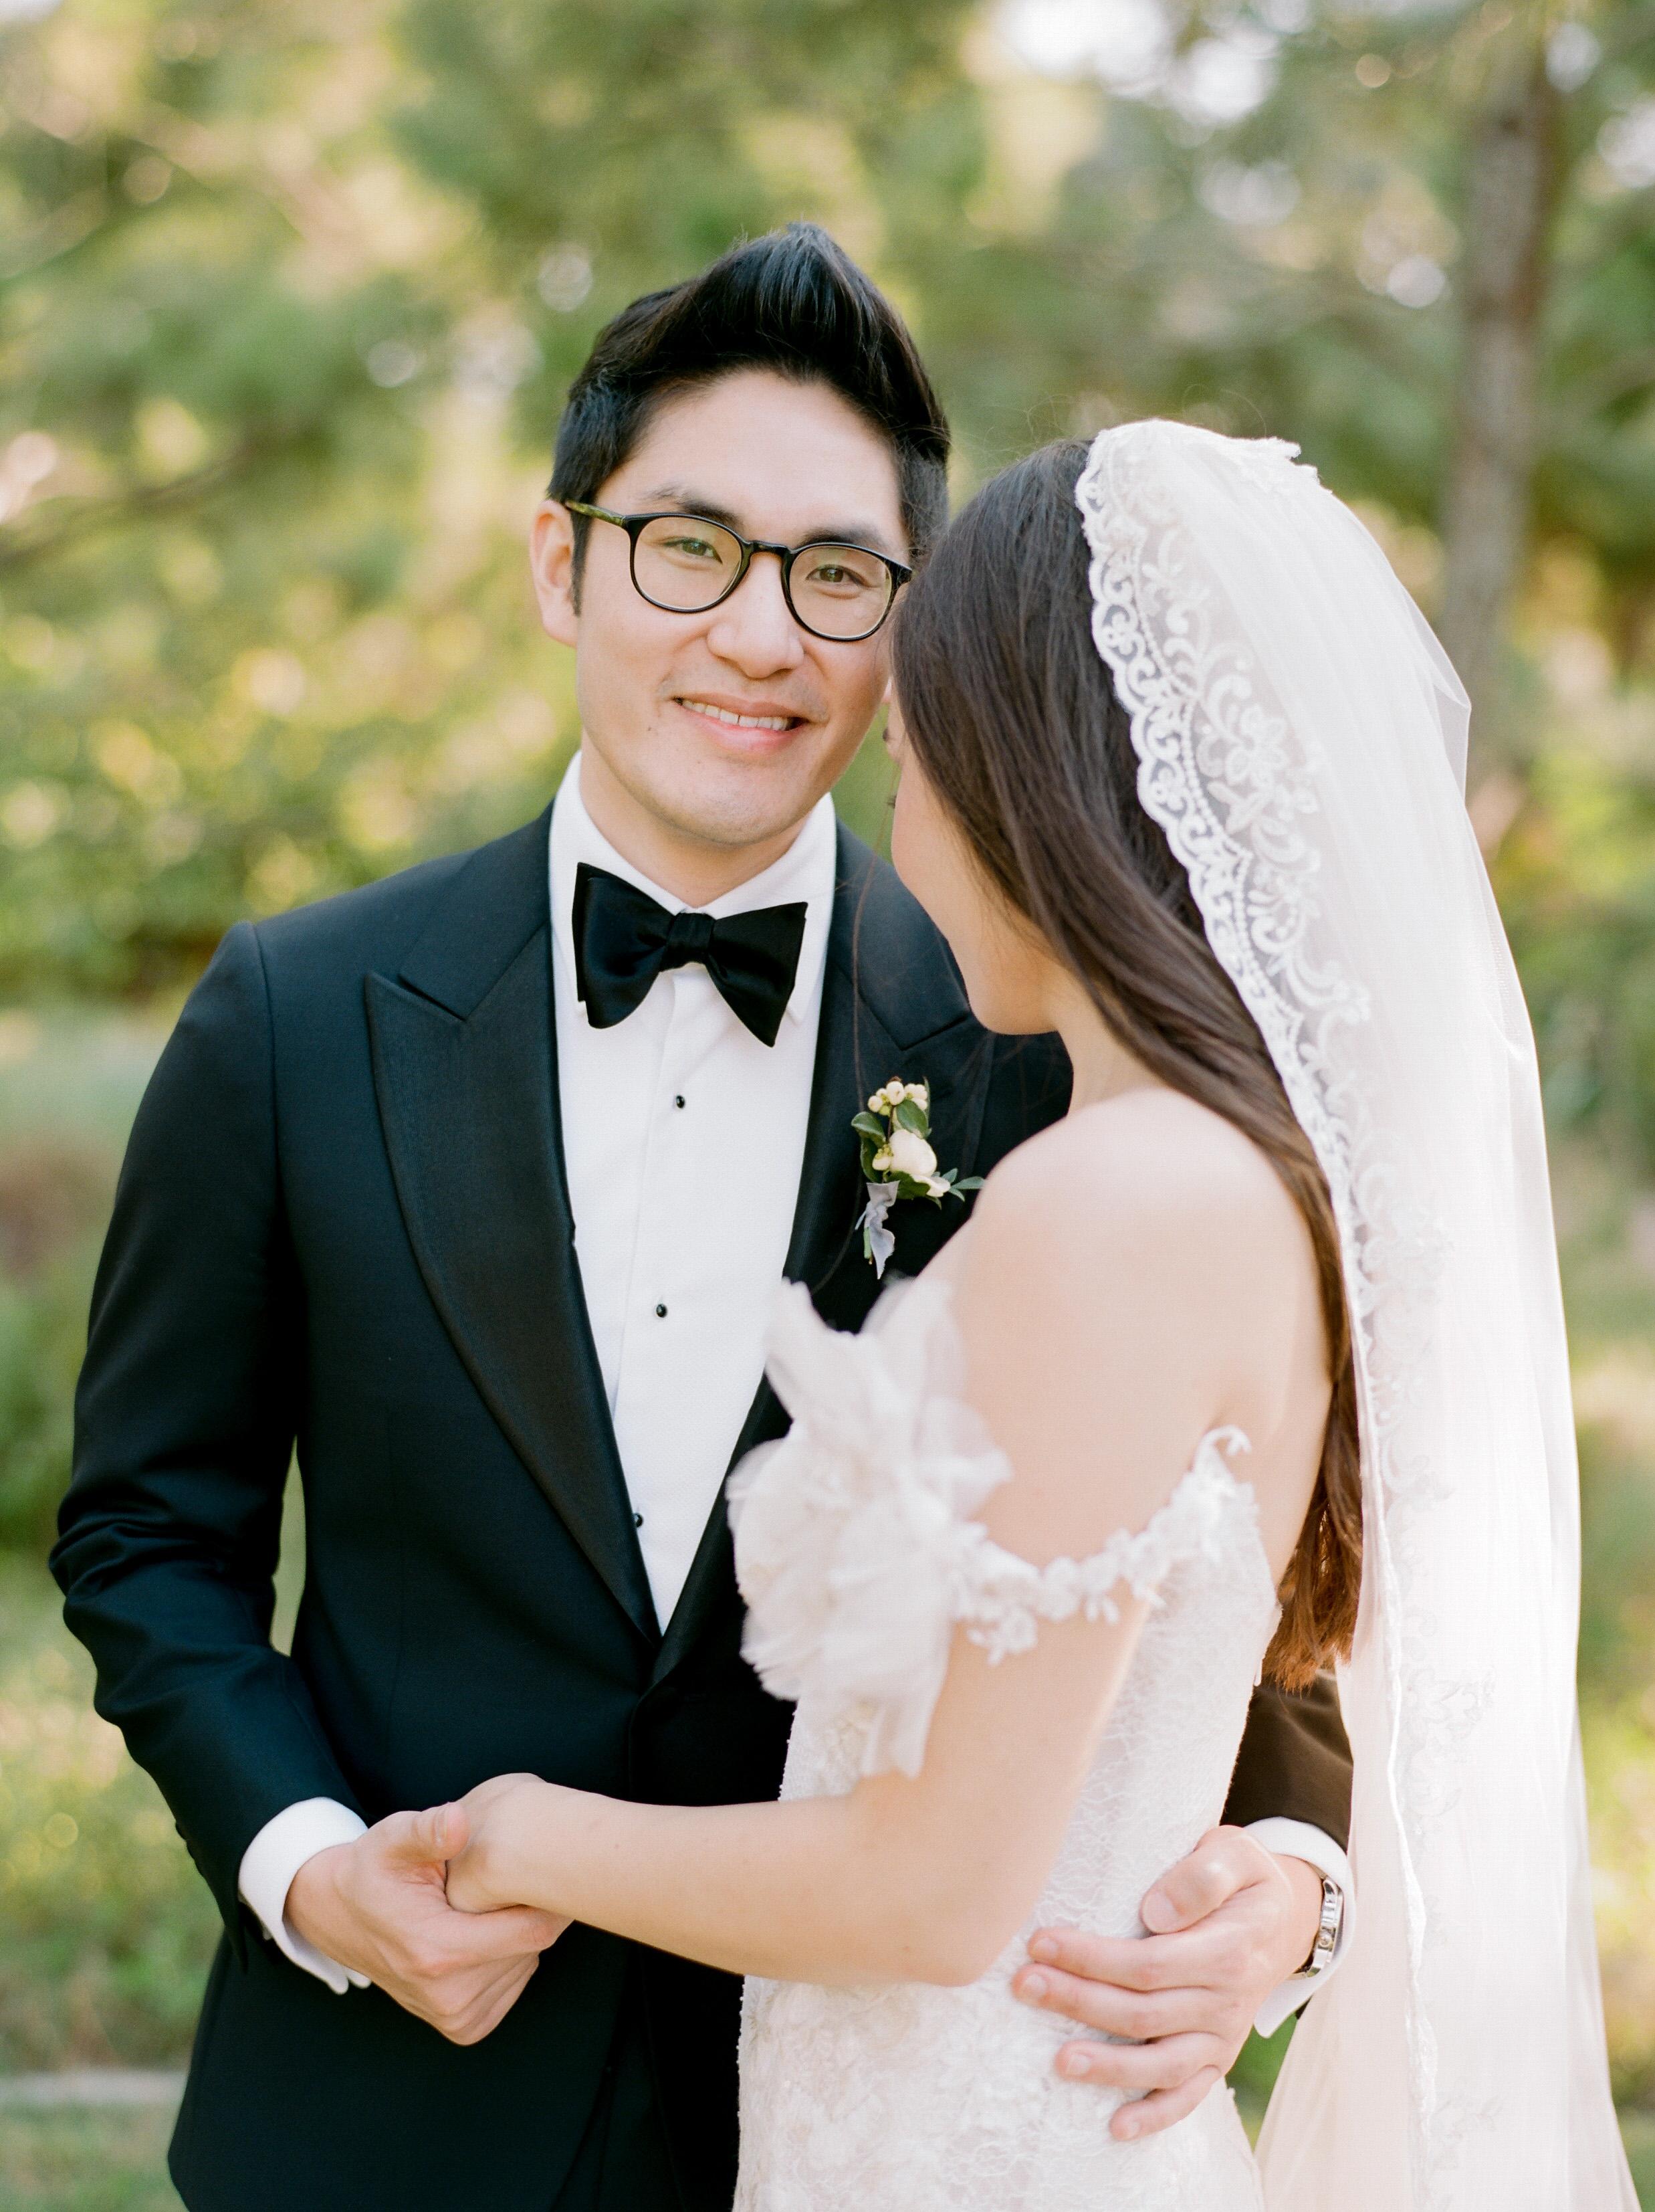 Martha-Stewart-Wedding-Dana-Fernandez-Photography-Josh-Texas-Film-Houston-Wedding-Fine-Art-Photographer-McGovern-Centennial-Gardens-Top-Best-75.jpg